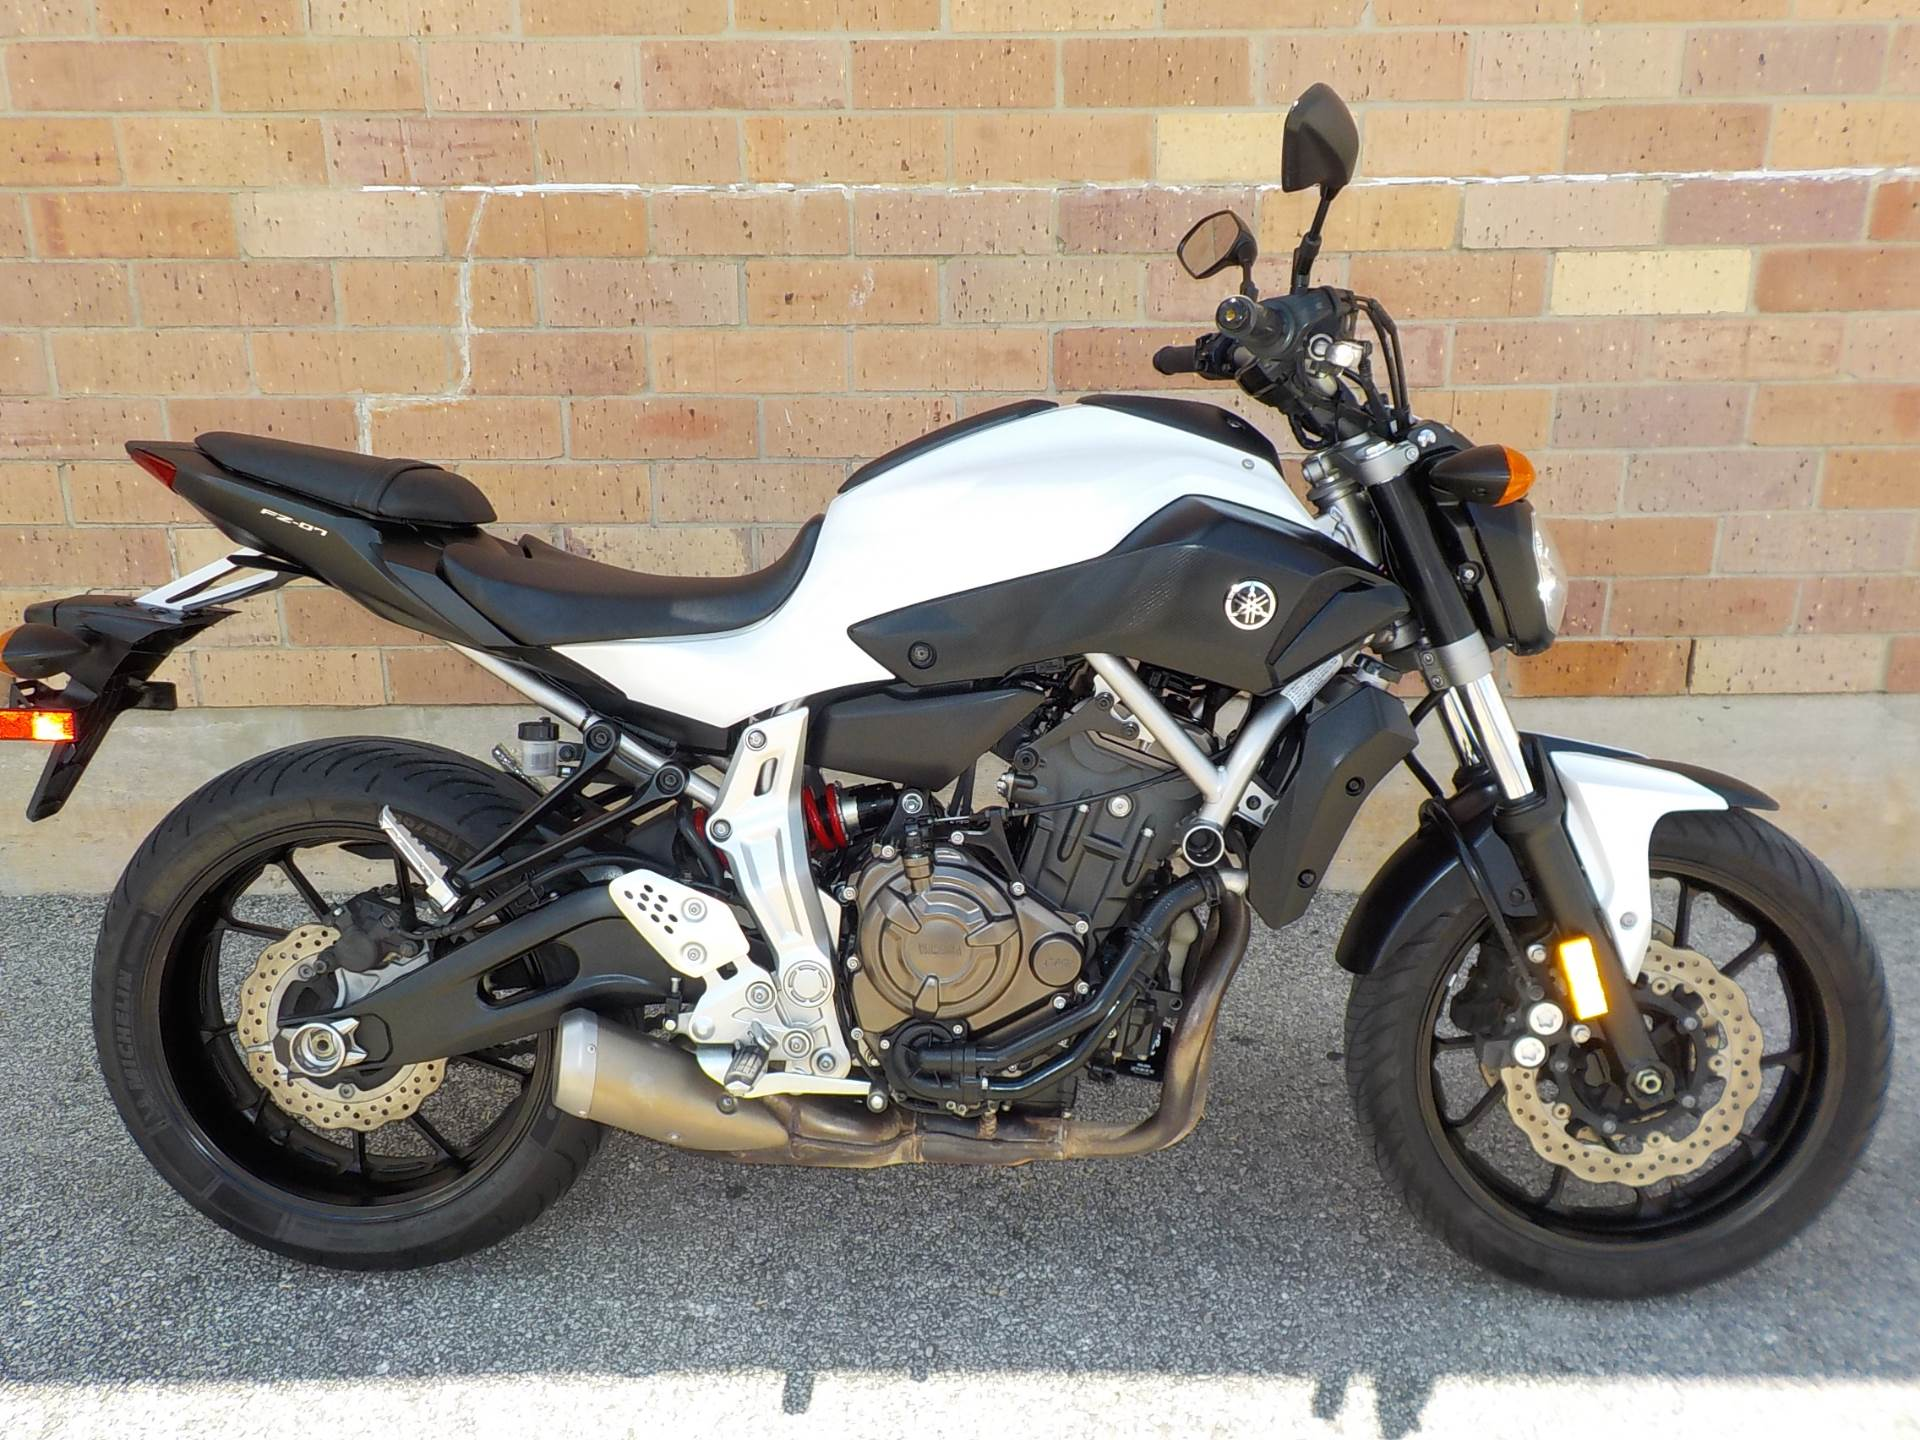 2015 Yamaha FZ-07 for sale 2394